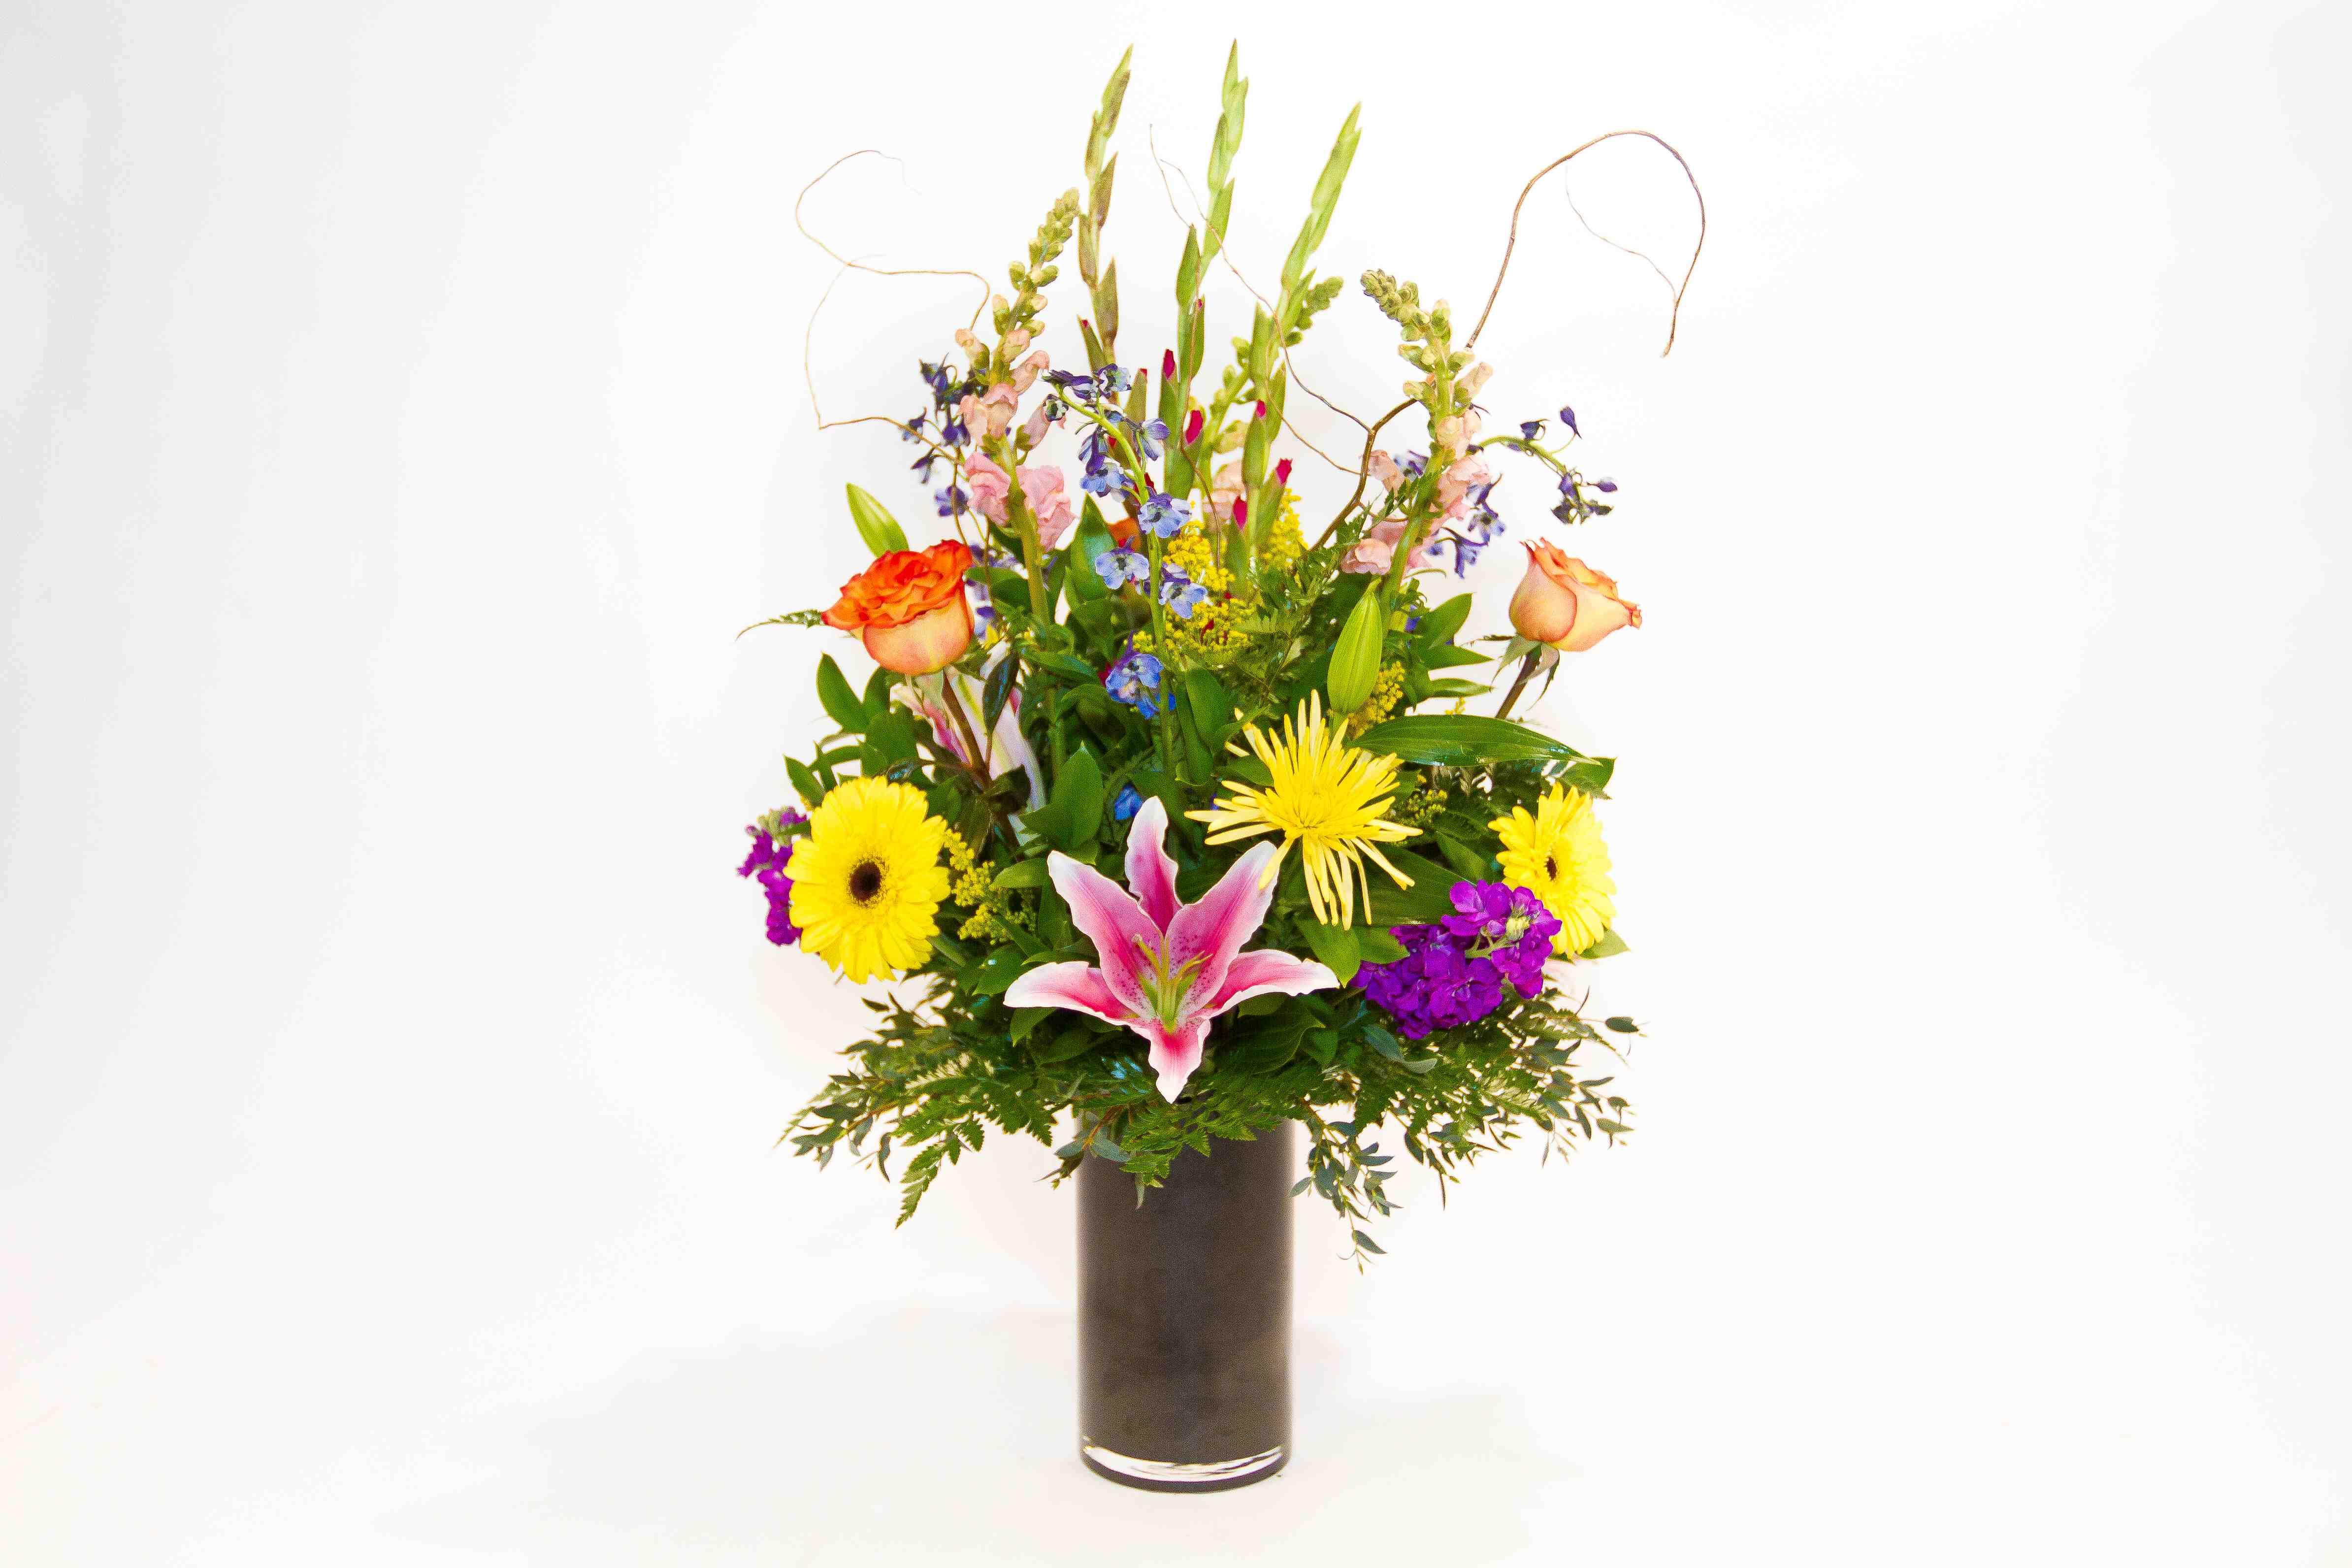 Flower Arrangements Gift Baskets : English garden jacobsen s flowers gift baskets